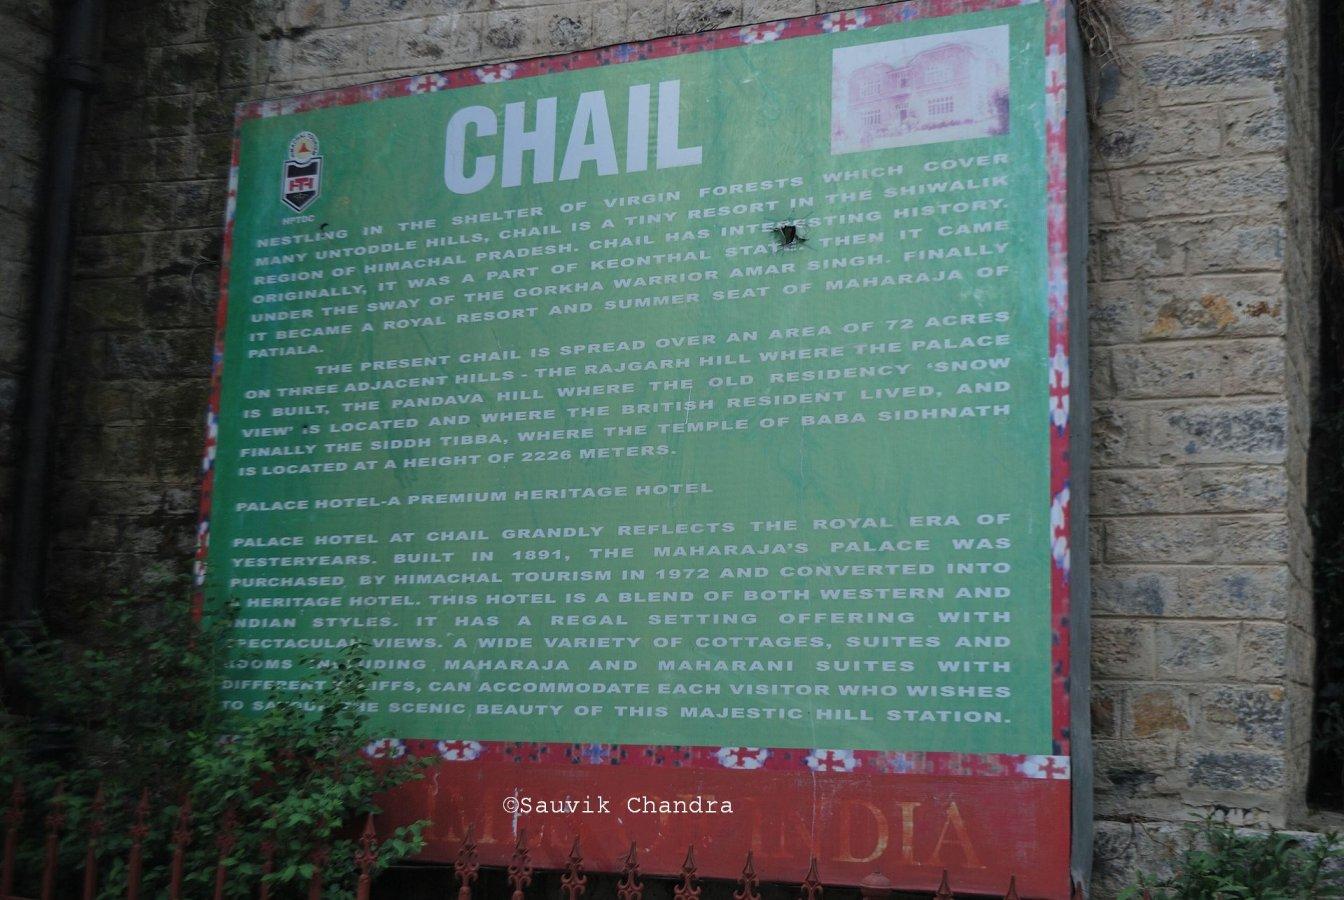 13 Chail Palace_000_April 2018_edited.jpg